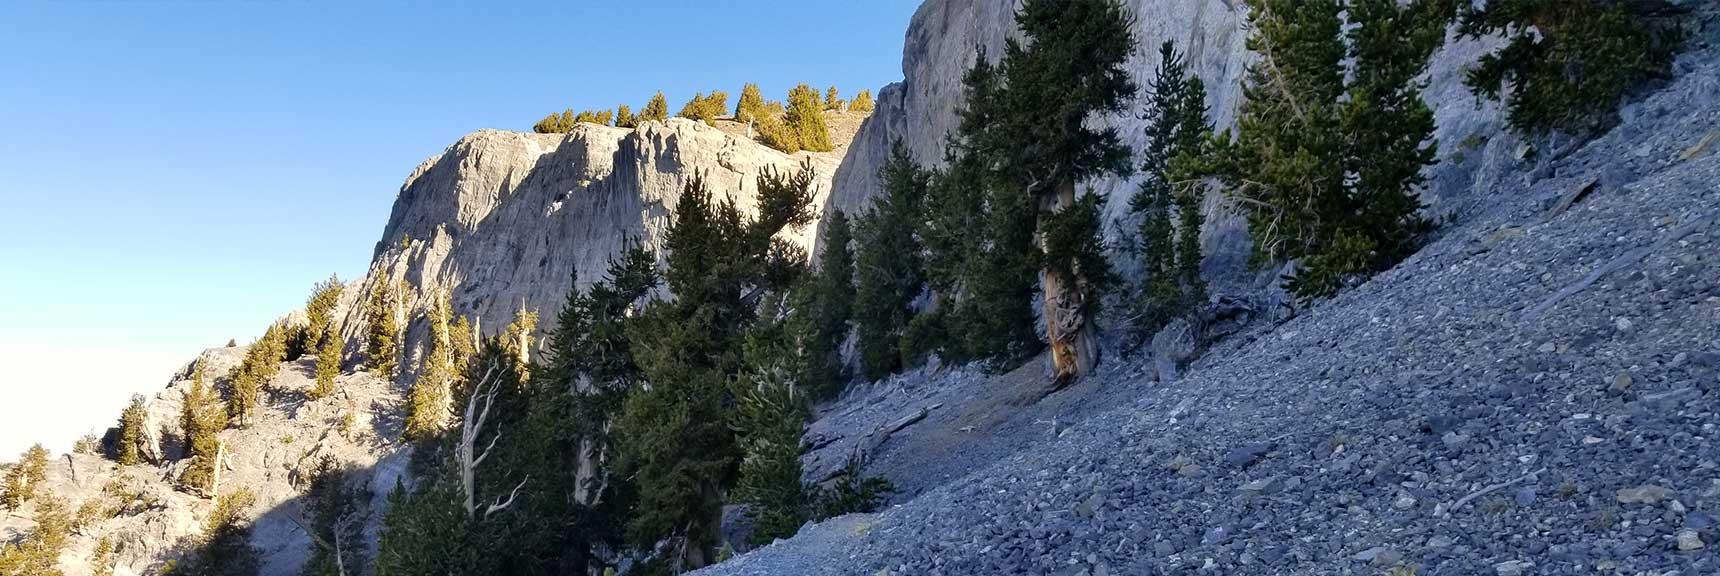 Traversing the Ledge Below Mummy Mountain Upper Cliff, Six Peak Circuit Adventure Strategy, Spring Mountains, Nevada